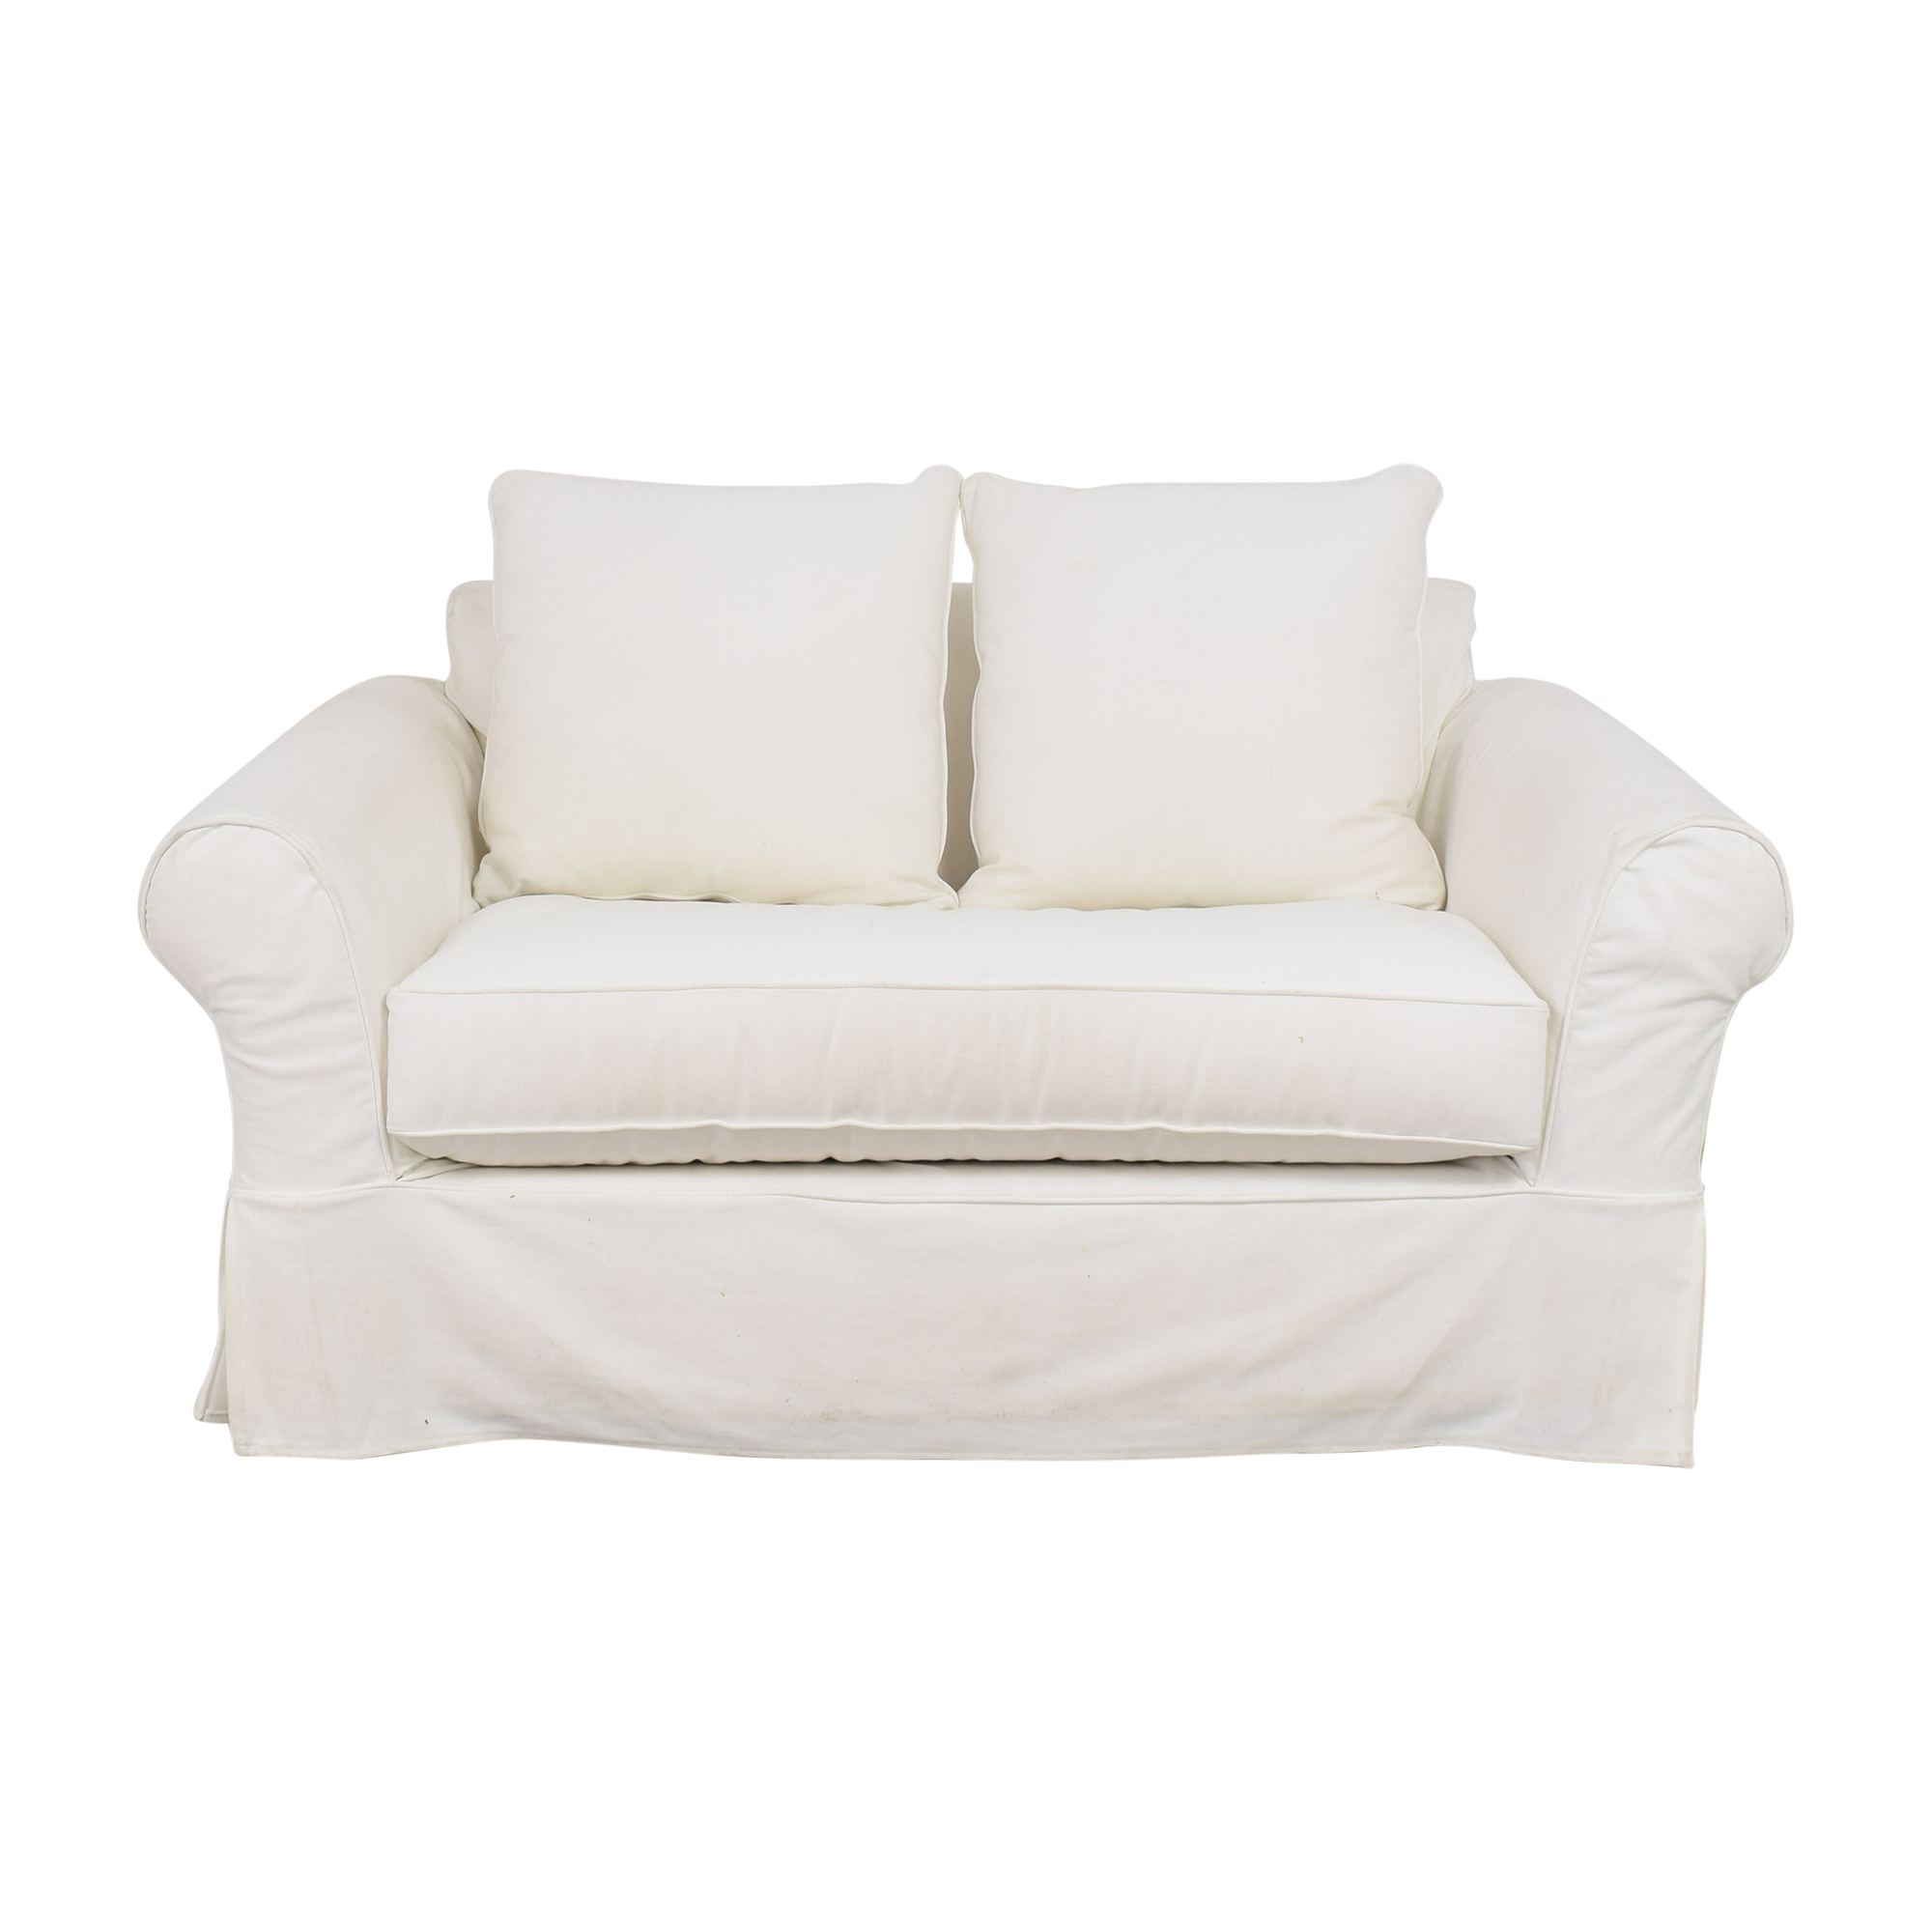 Pottery Barn Comfort Roll Arm Twin Sleeper Chair sale